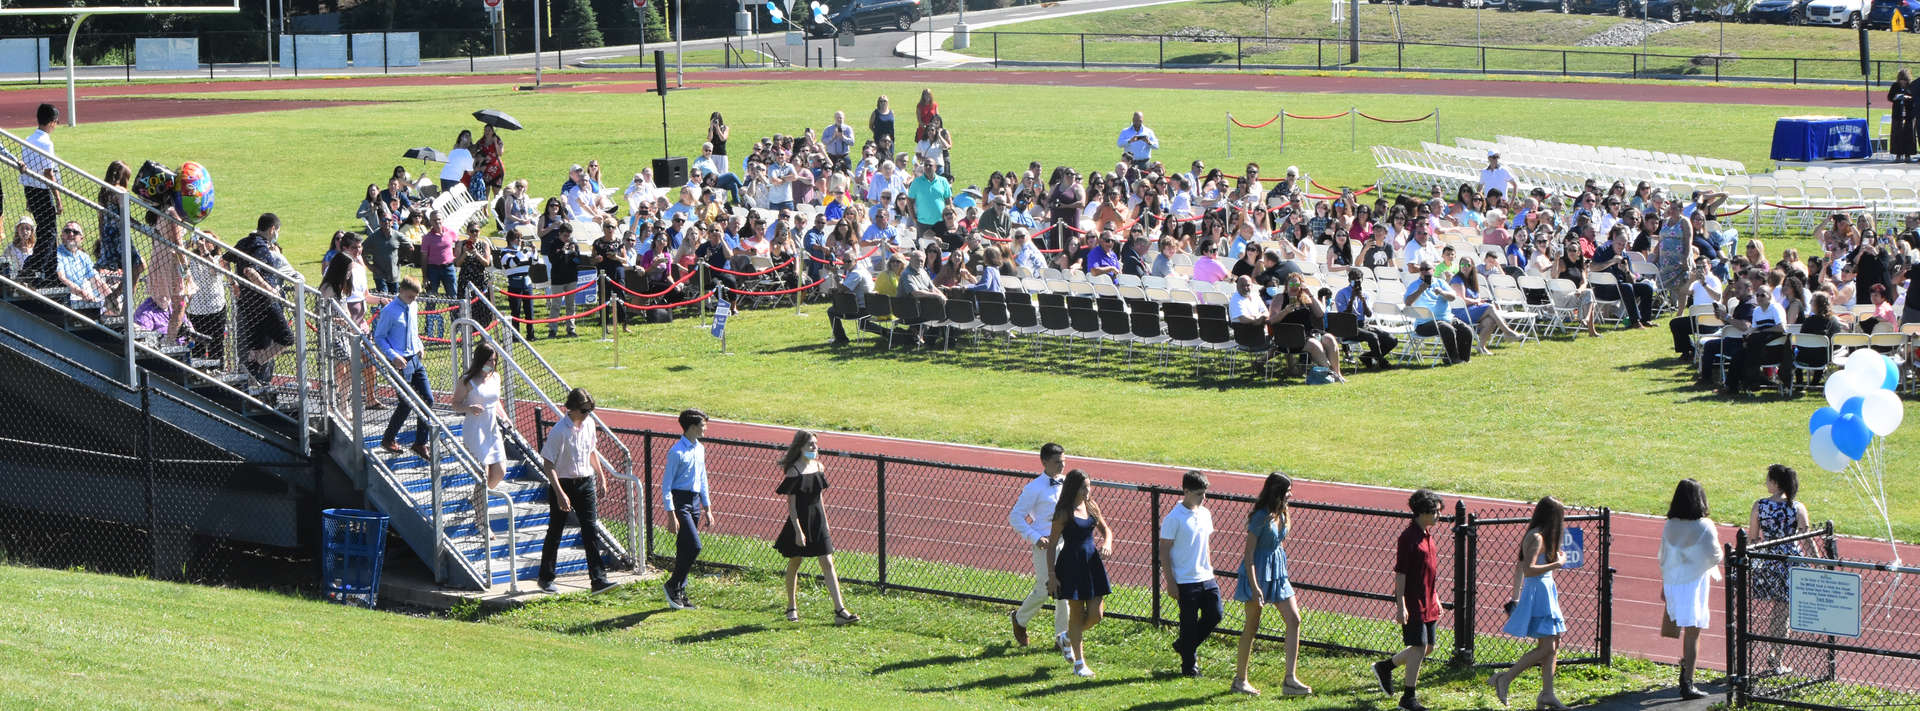 Students walk into stadium set up for graduation